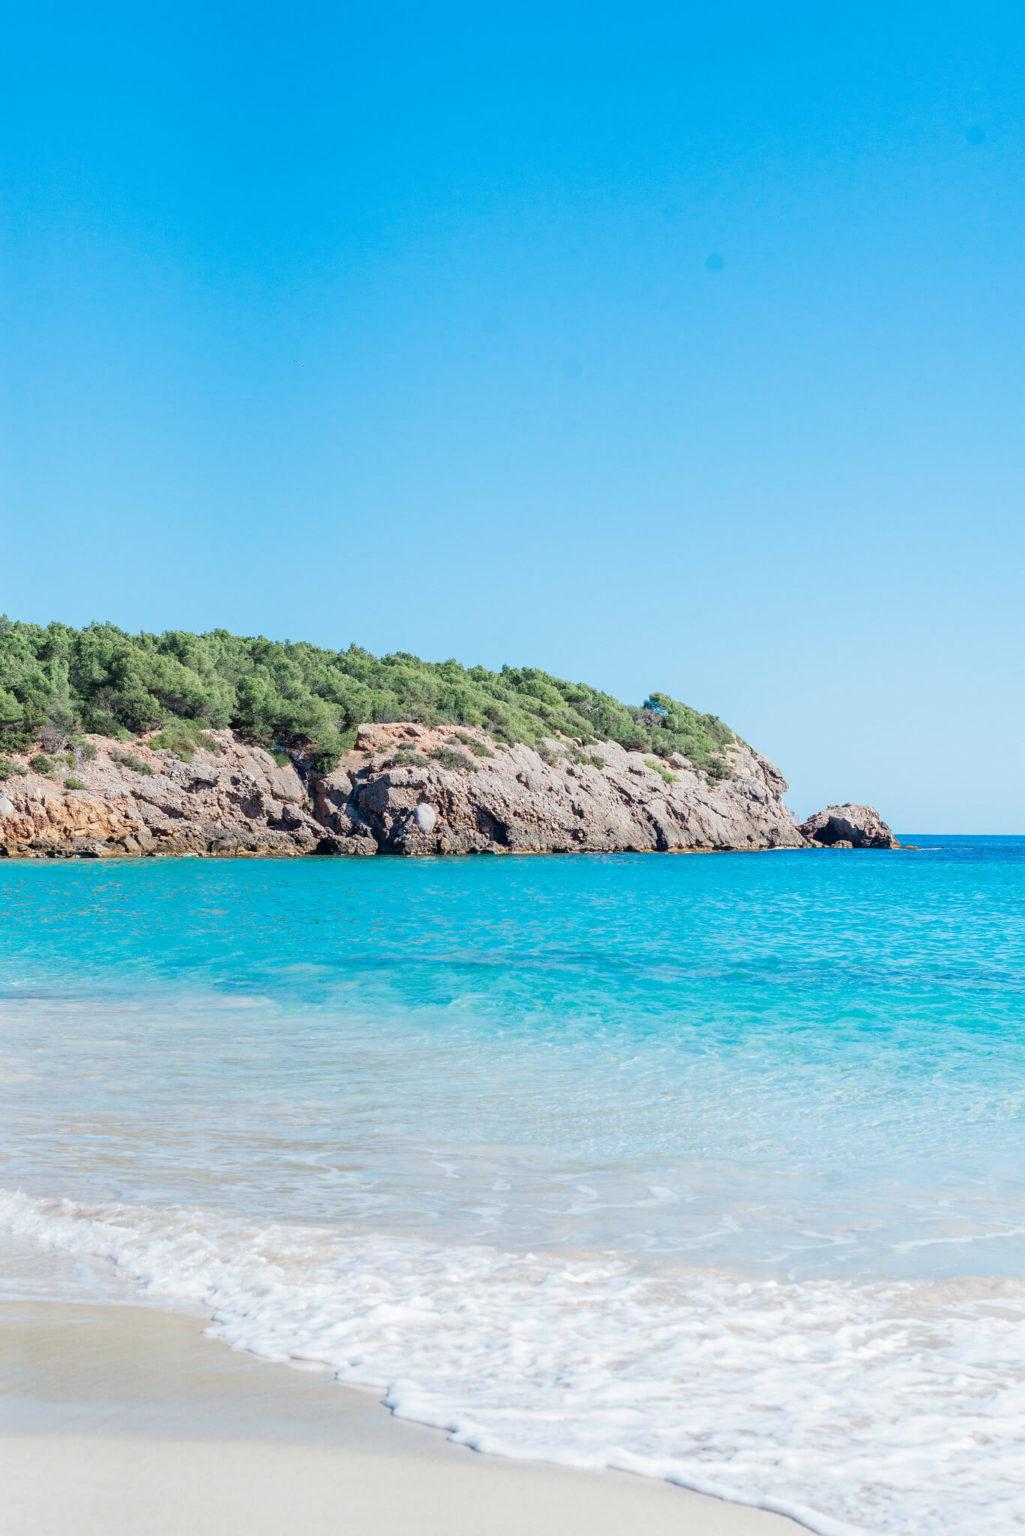 https://www.white-ibiza.com/wp-content/uploads/2020/03/ibiza-beaches-cala-nova-03-1025x1536.jpg